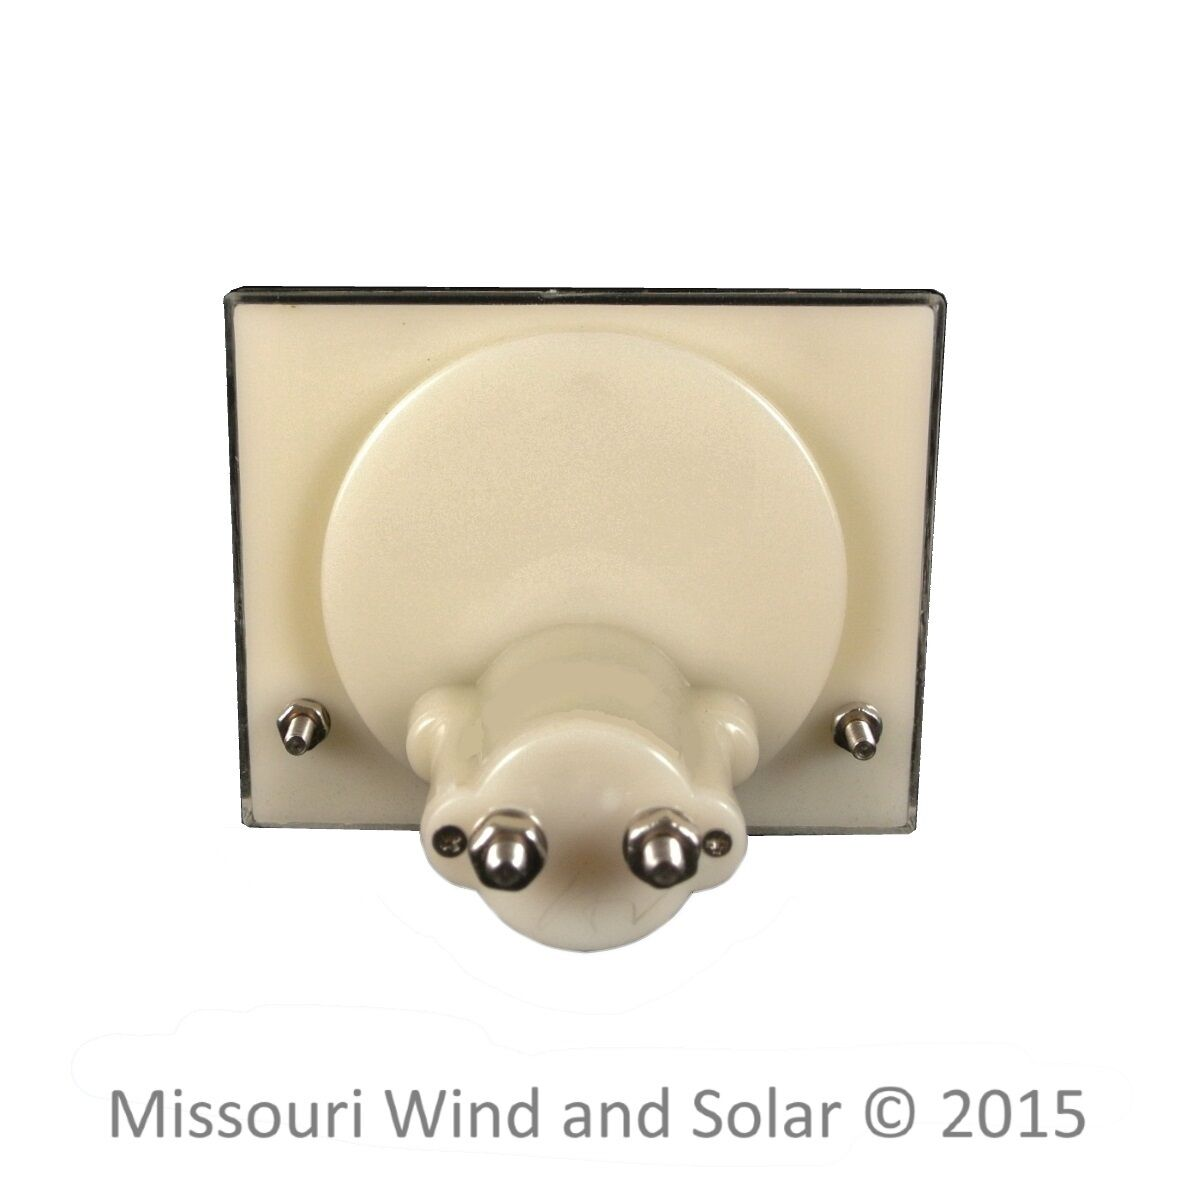 12 Volt Dc Amp Meter Analog : Dc amp analog meter for wind turbine generators and